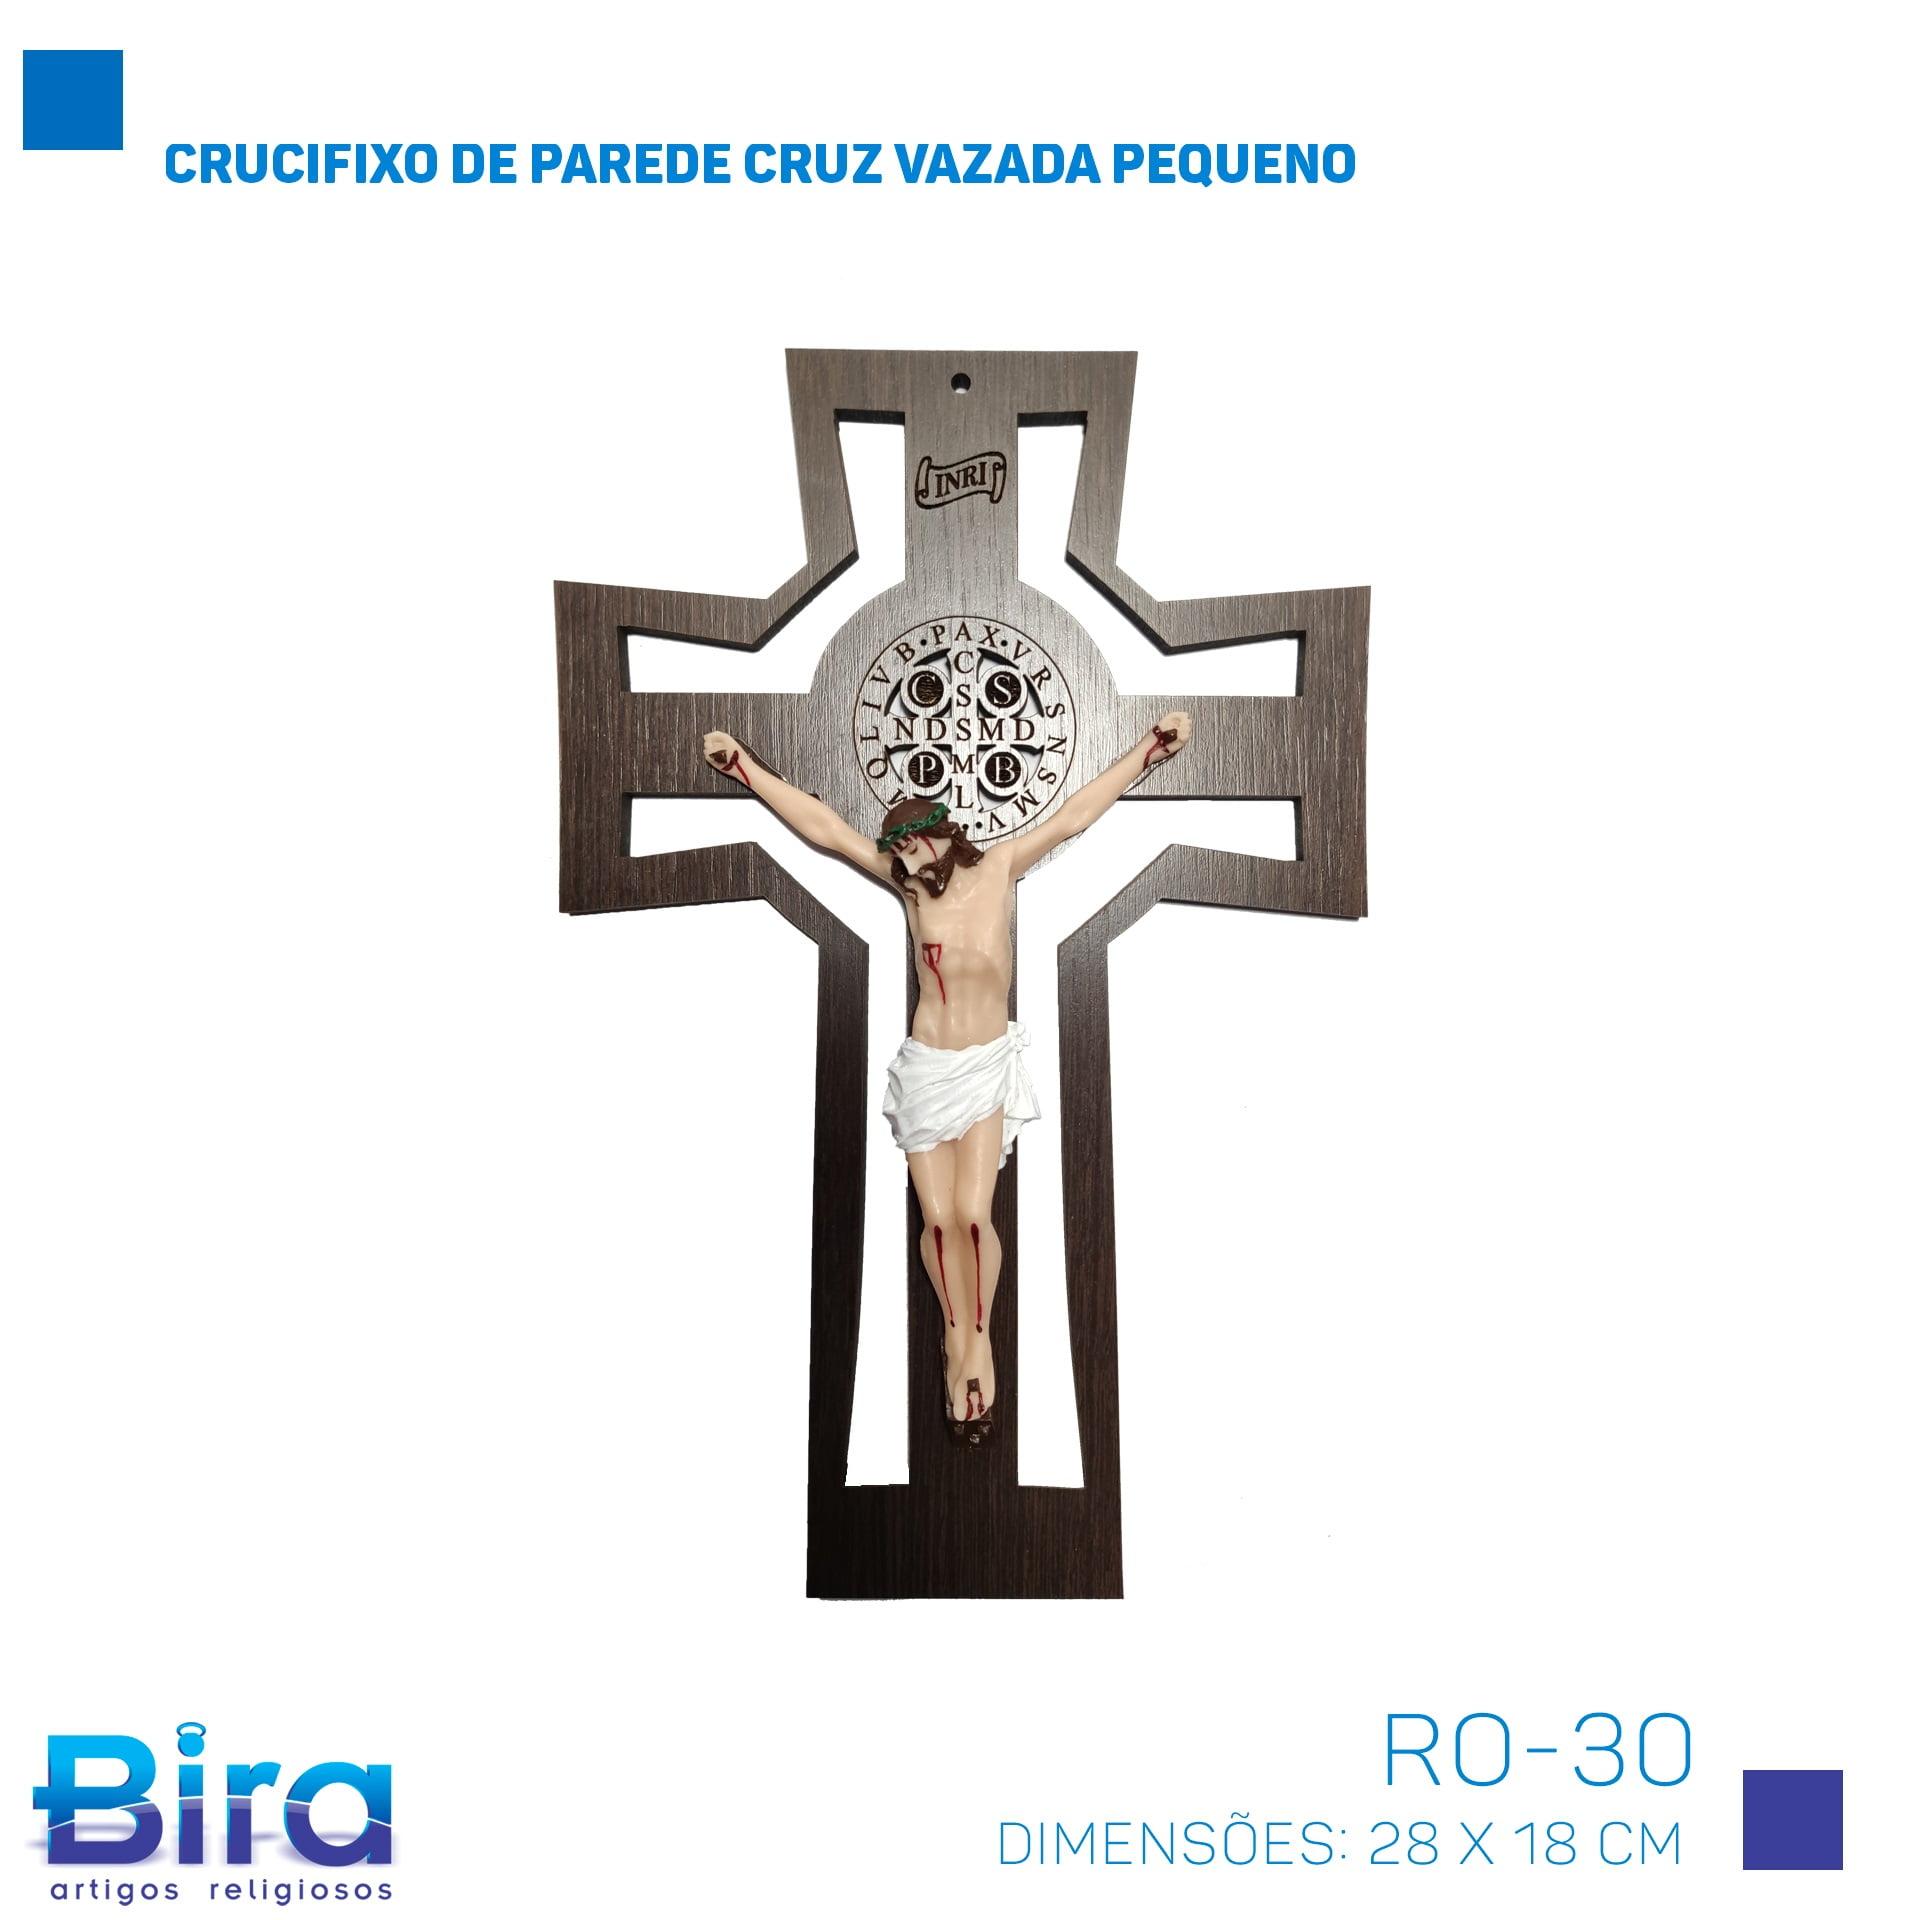 Bira Artigos Religiosos - CRUCIFIXO DE PAREDE CRUZ VAZADA PEQUENA